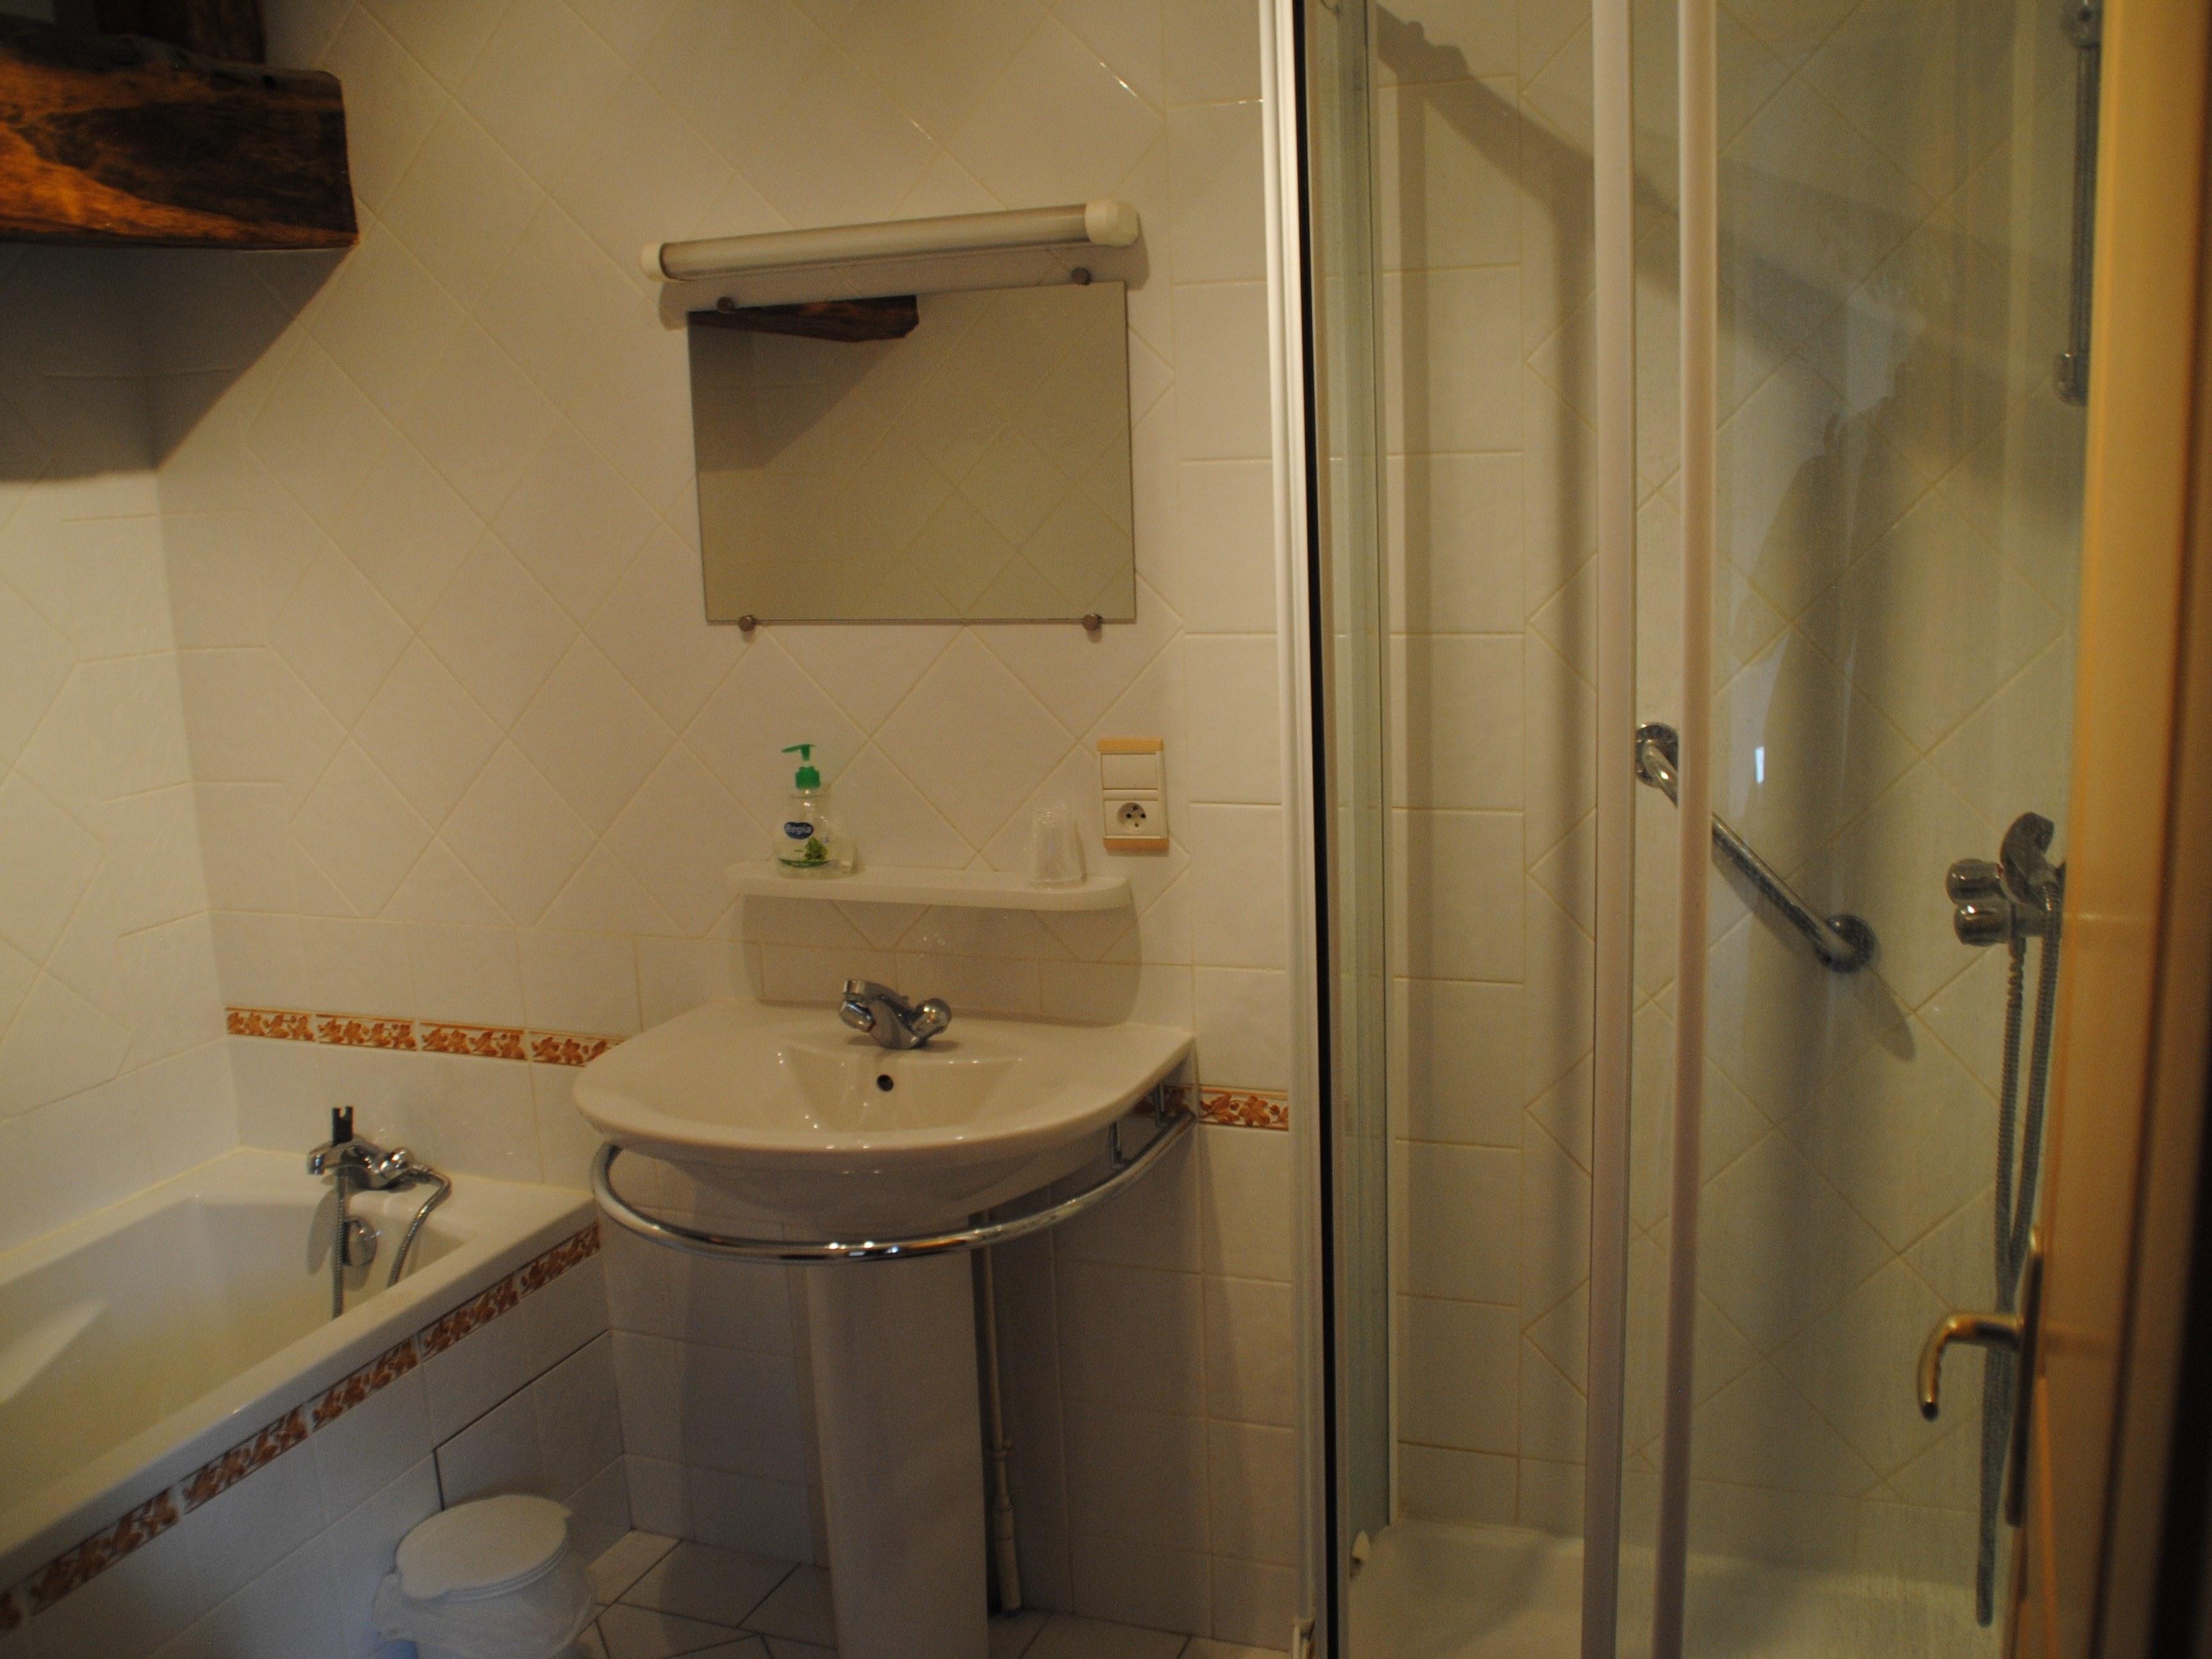 baroville-champagne-salle-de-bain-miroir-lavabo-baignoire